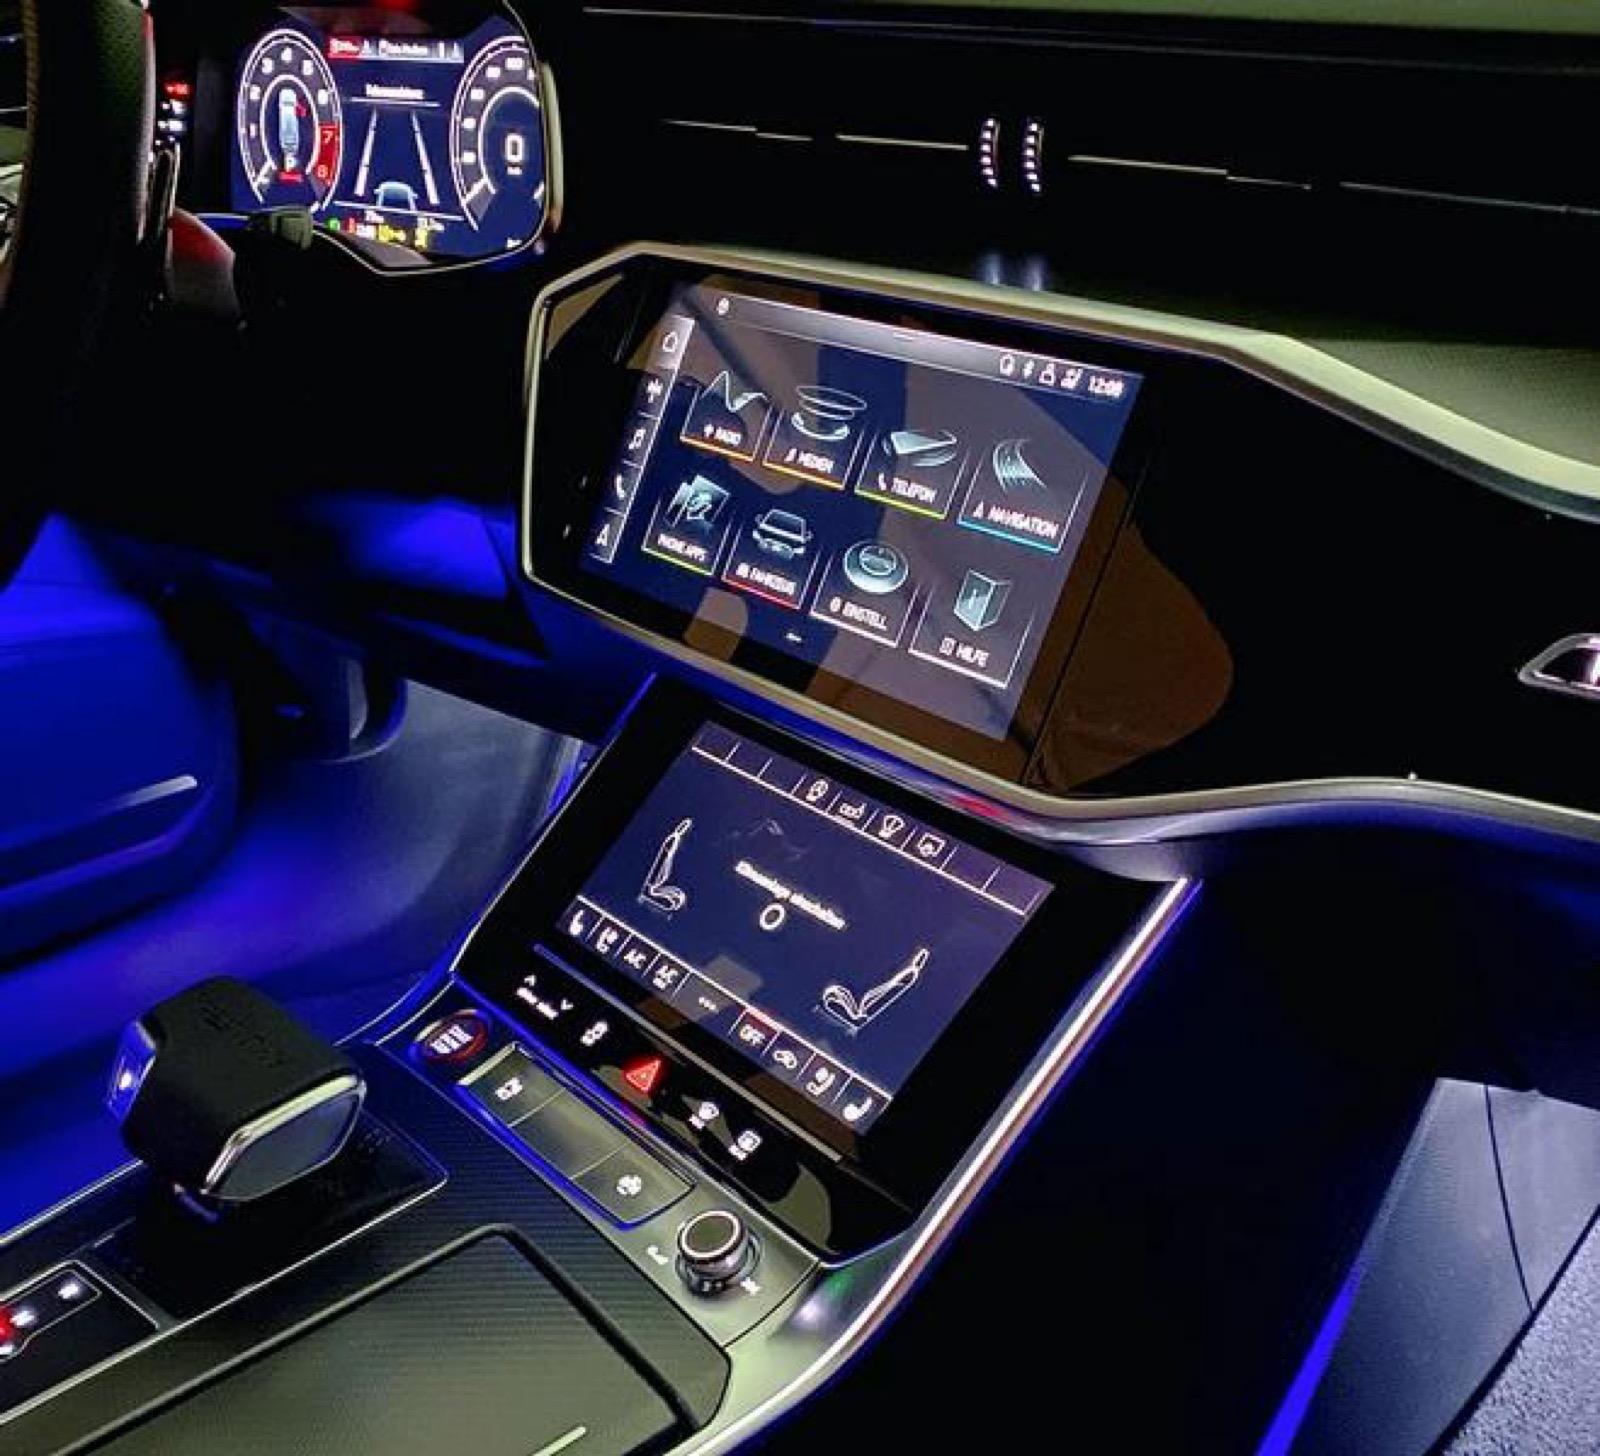 Audi-RS6-Avant-by-Keyvany-8